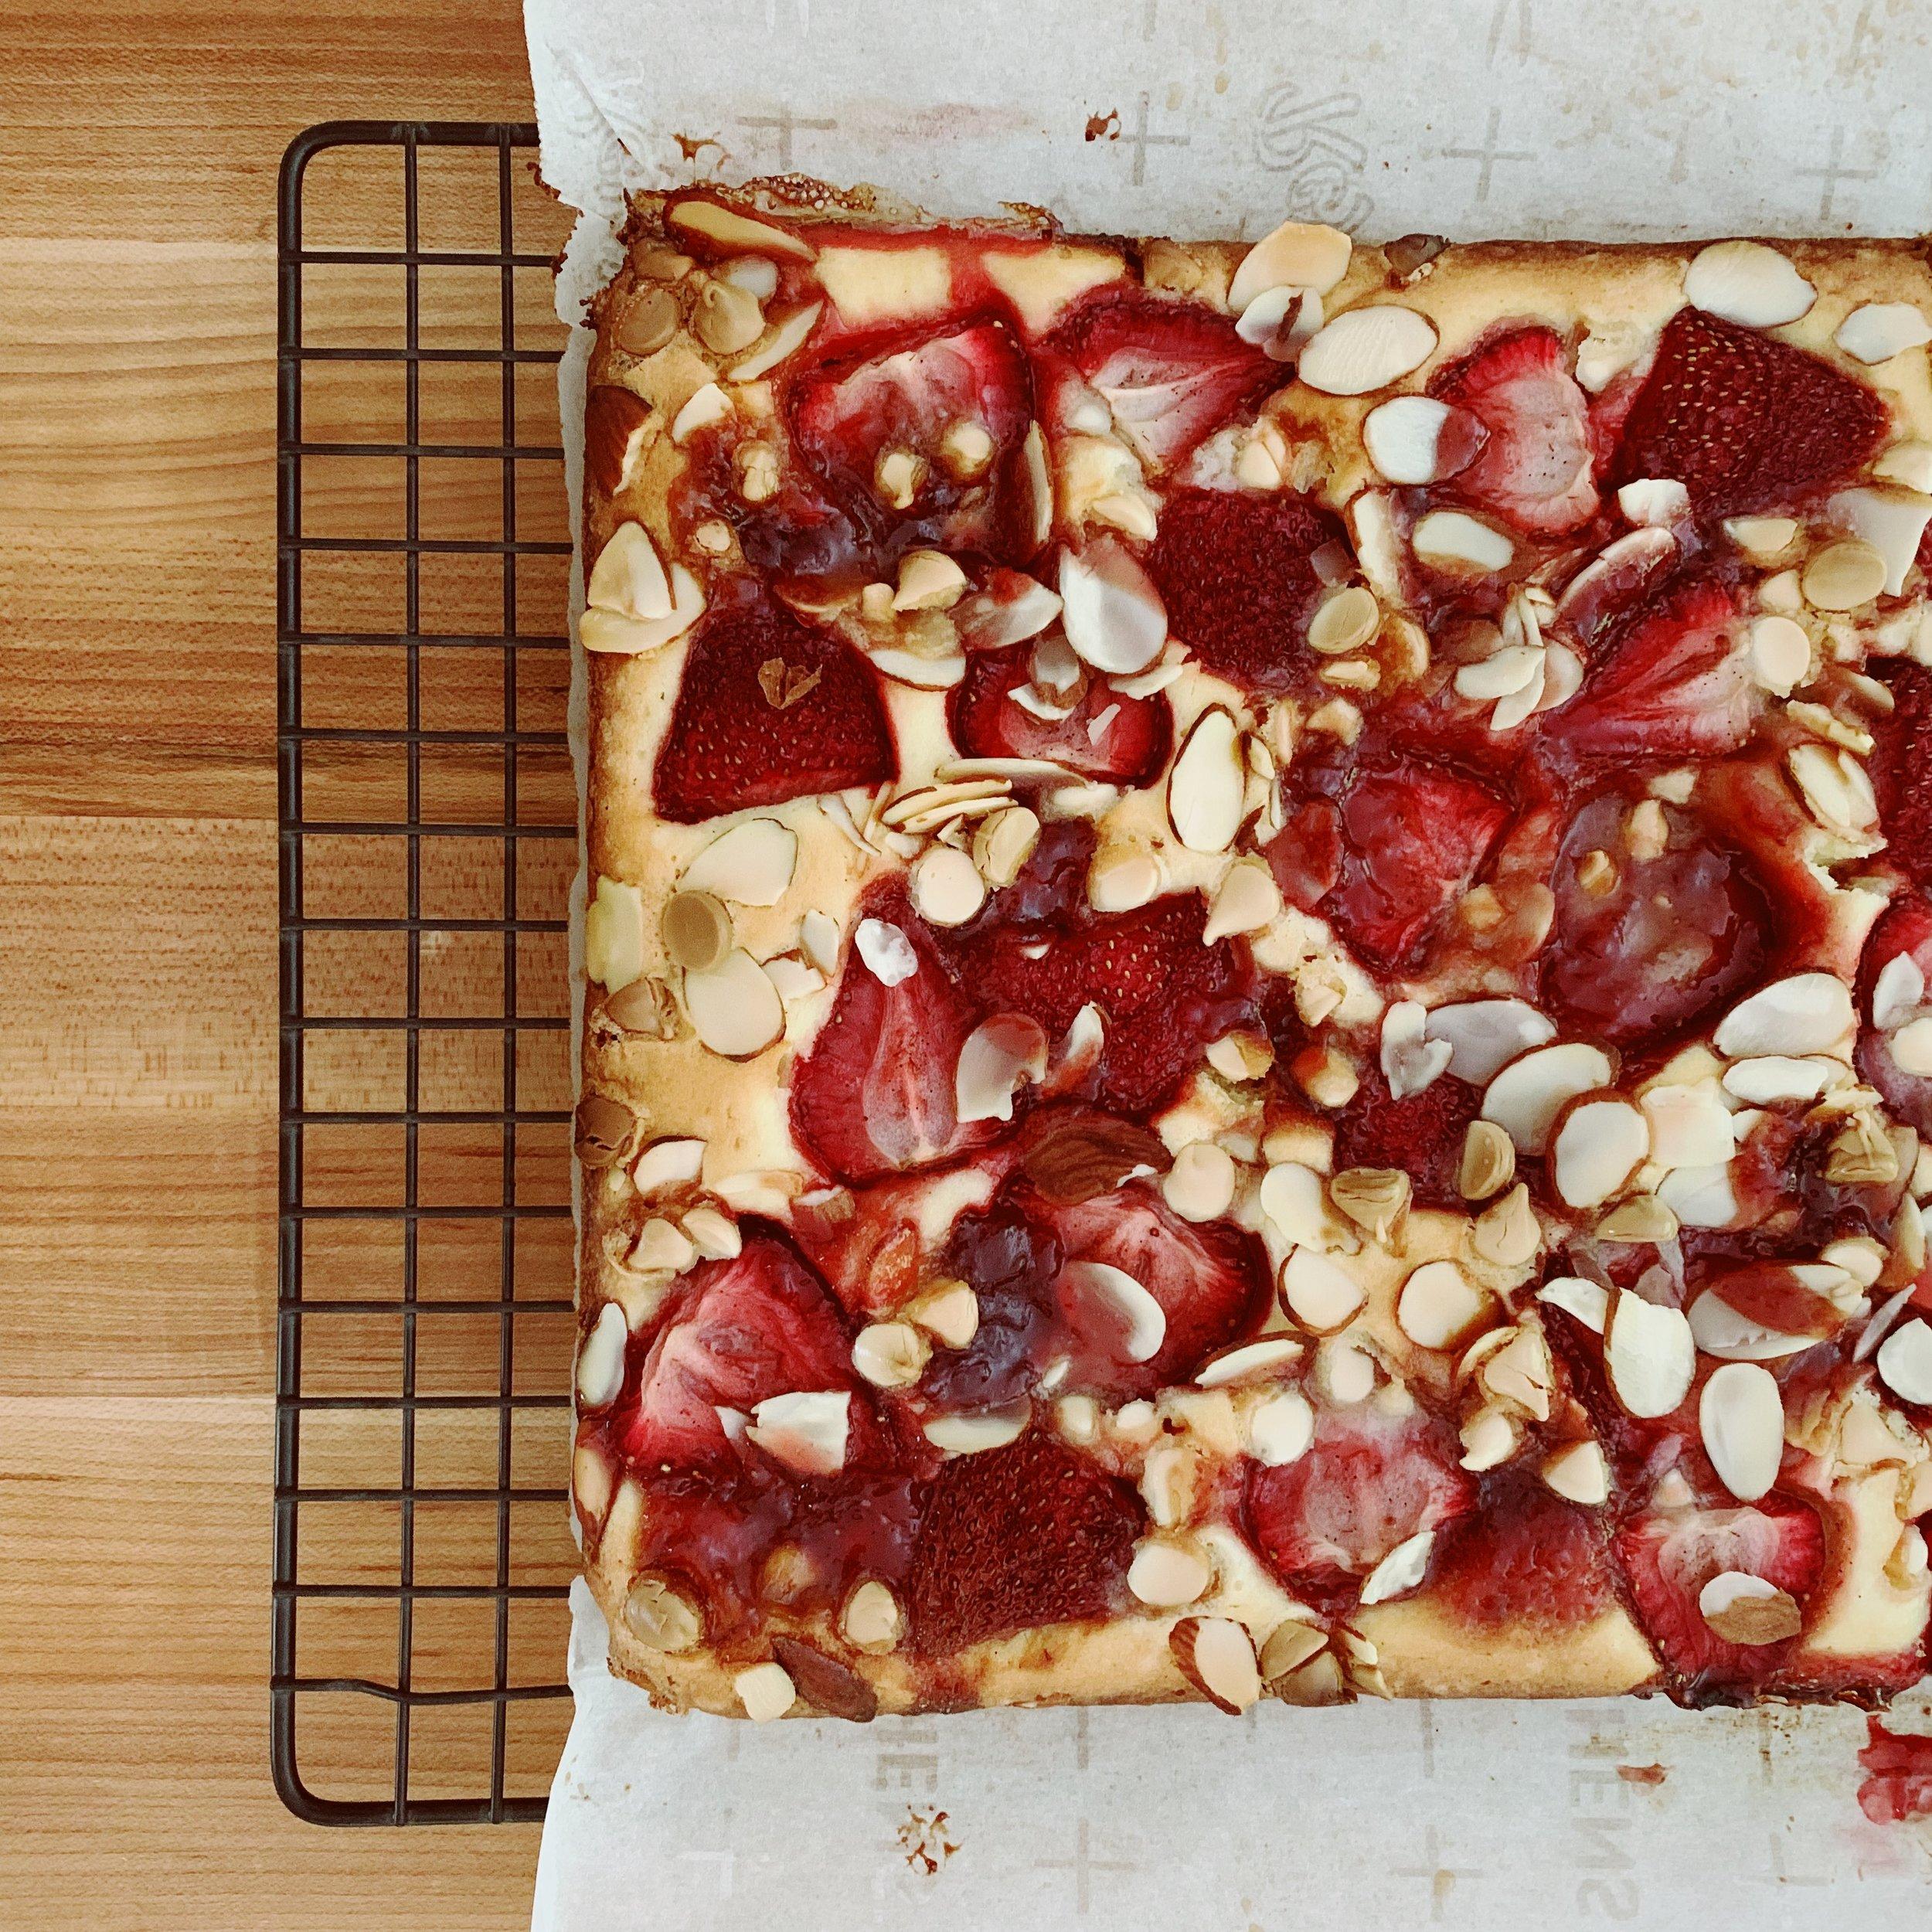 Roasted Strawberry and White Chocolate Sheet Cake